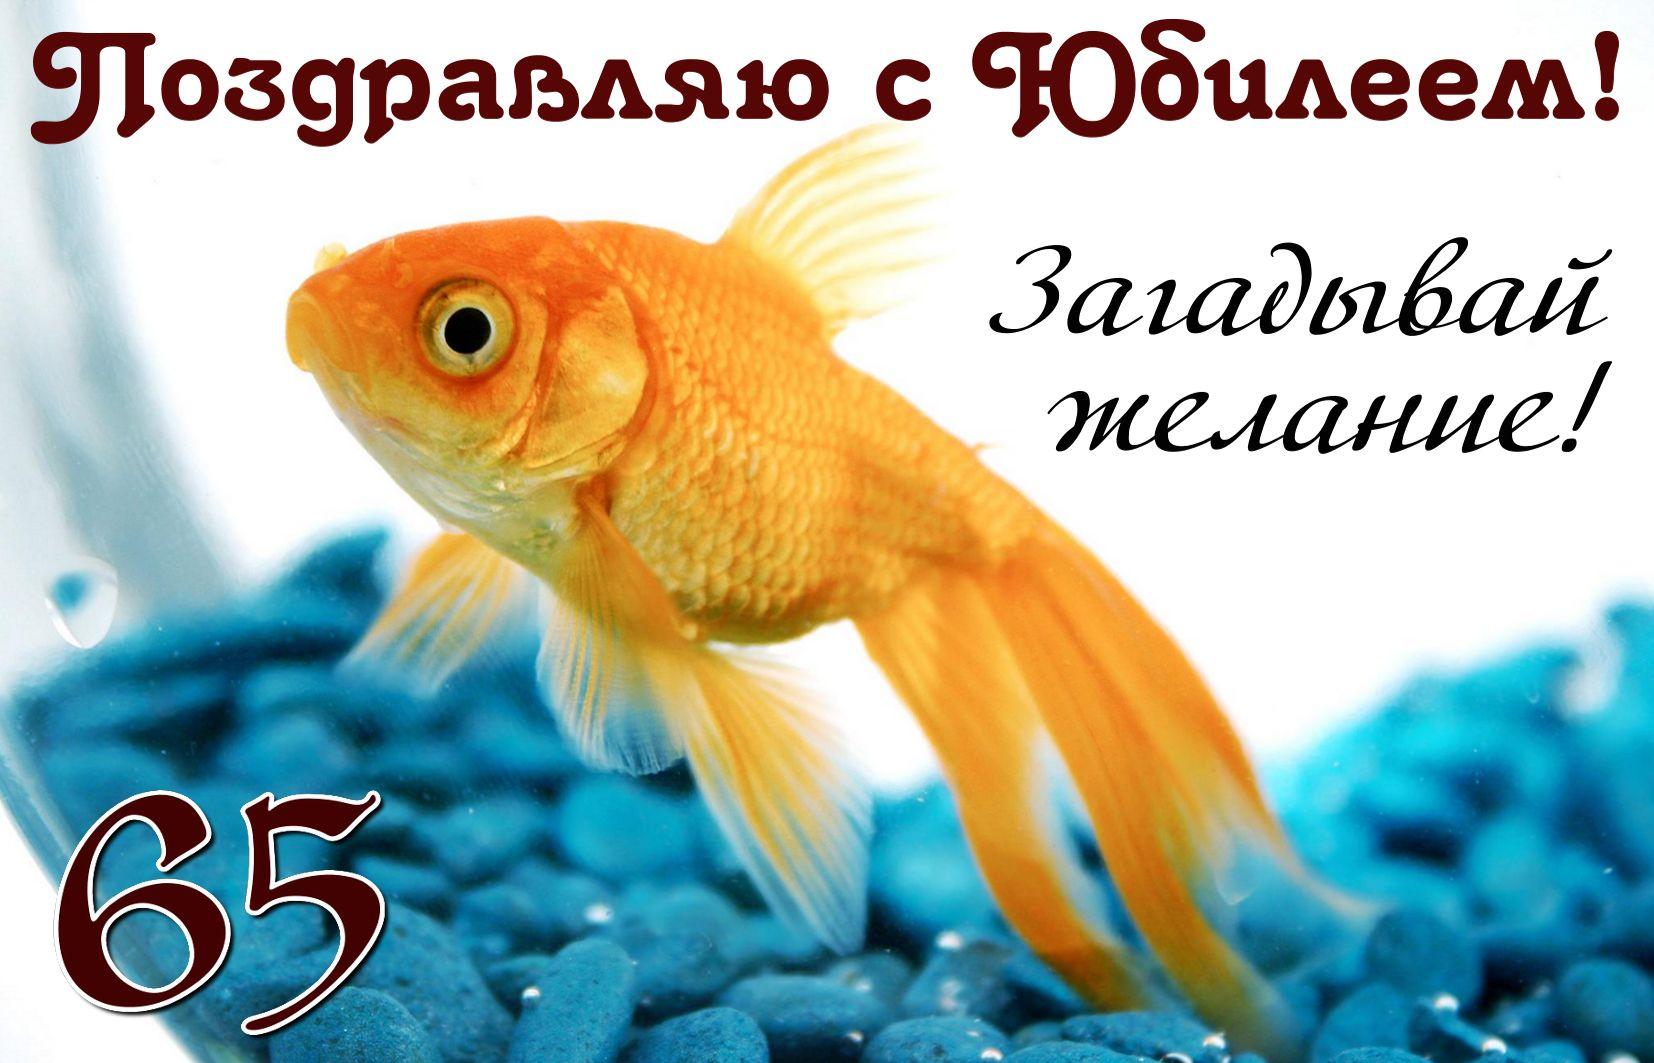 Открытка на юбилей 65 лет - золотая рыбка на фоне синих камешков